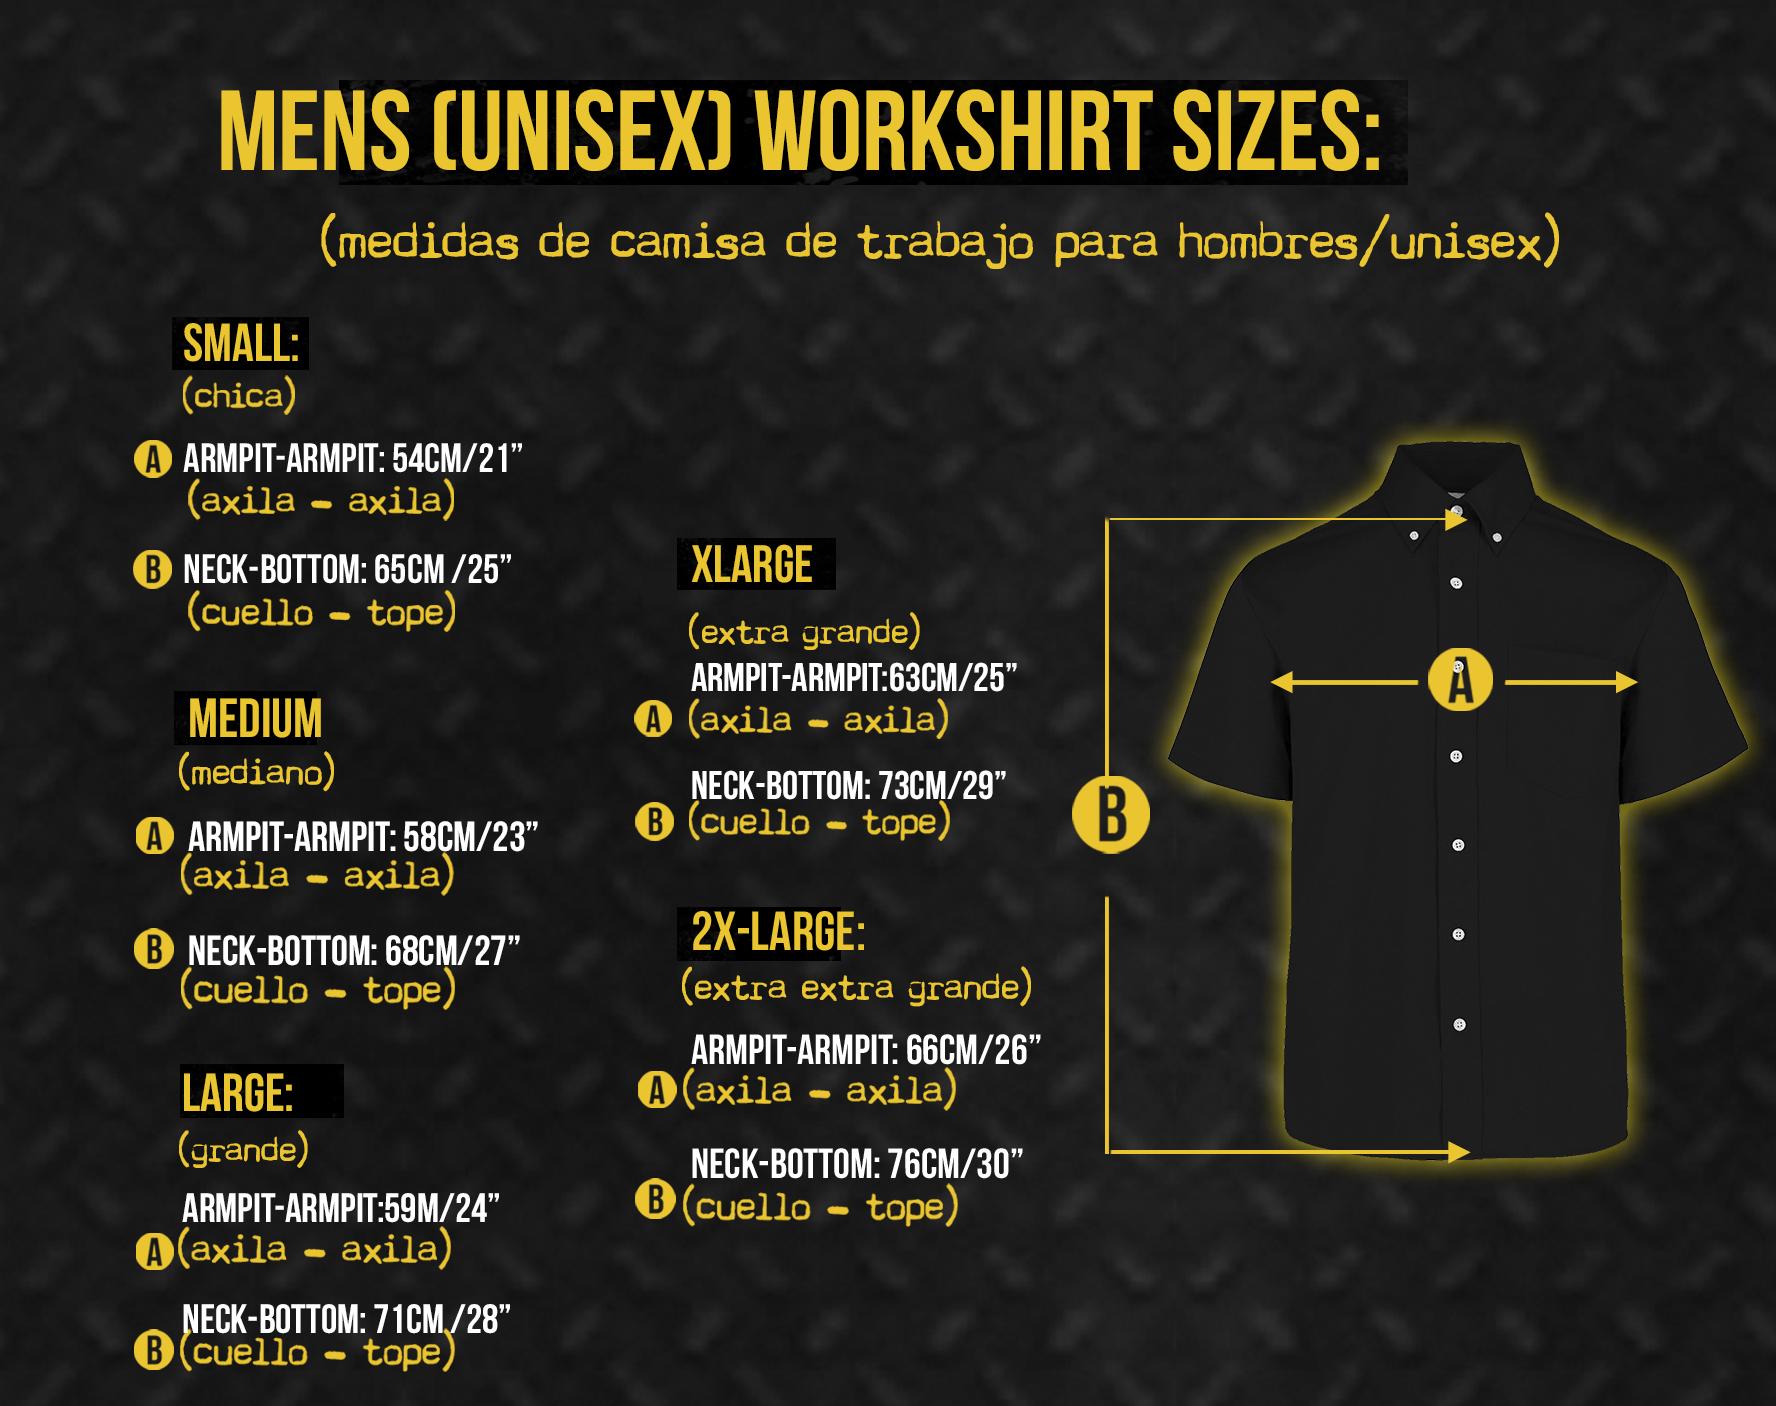 mens-unisex-workshirts-sizes-01.jpg